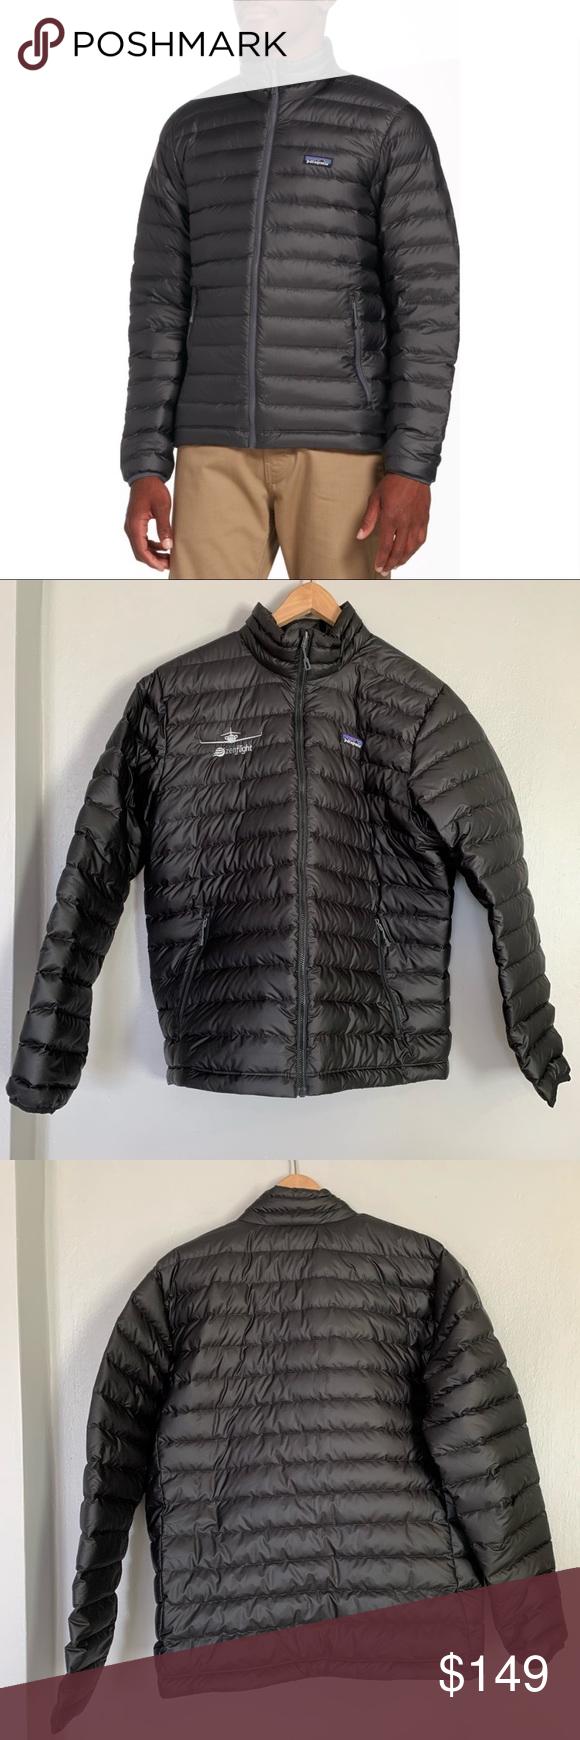 Patagonia puffer hoodie mens XL Mens xl, Patagonia